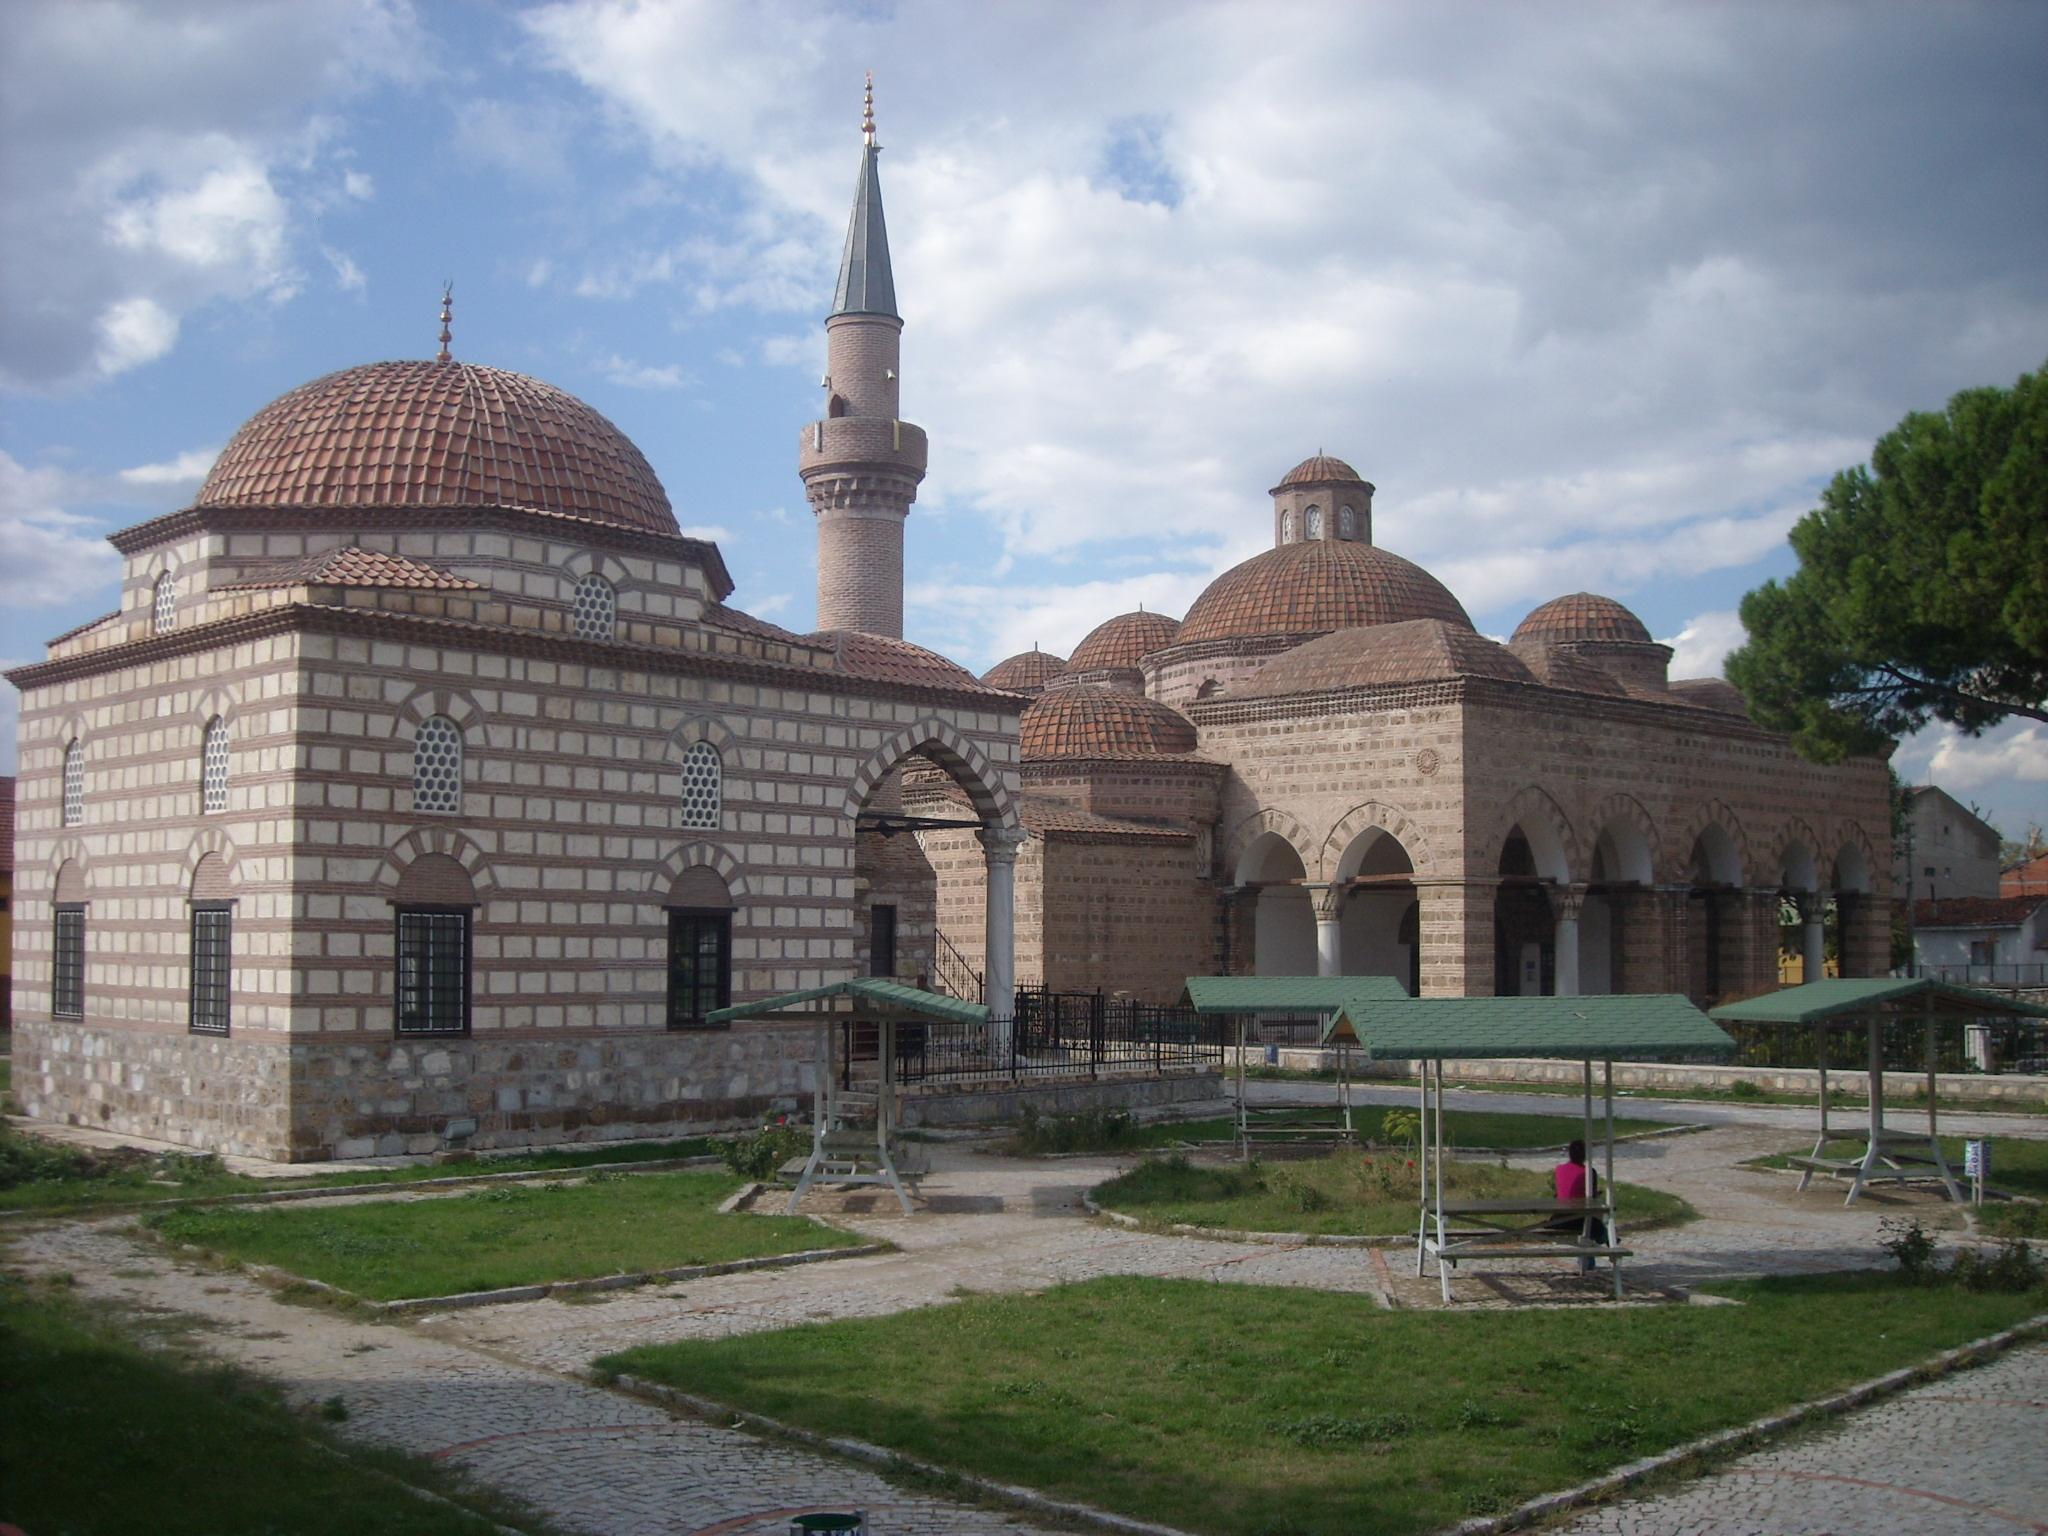 File:Iznik museum.JPG - Wikimedia Commons